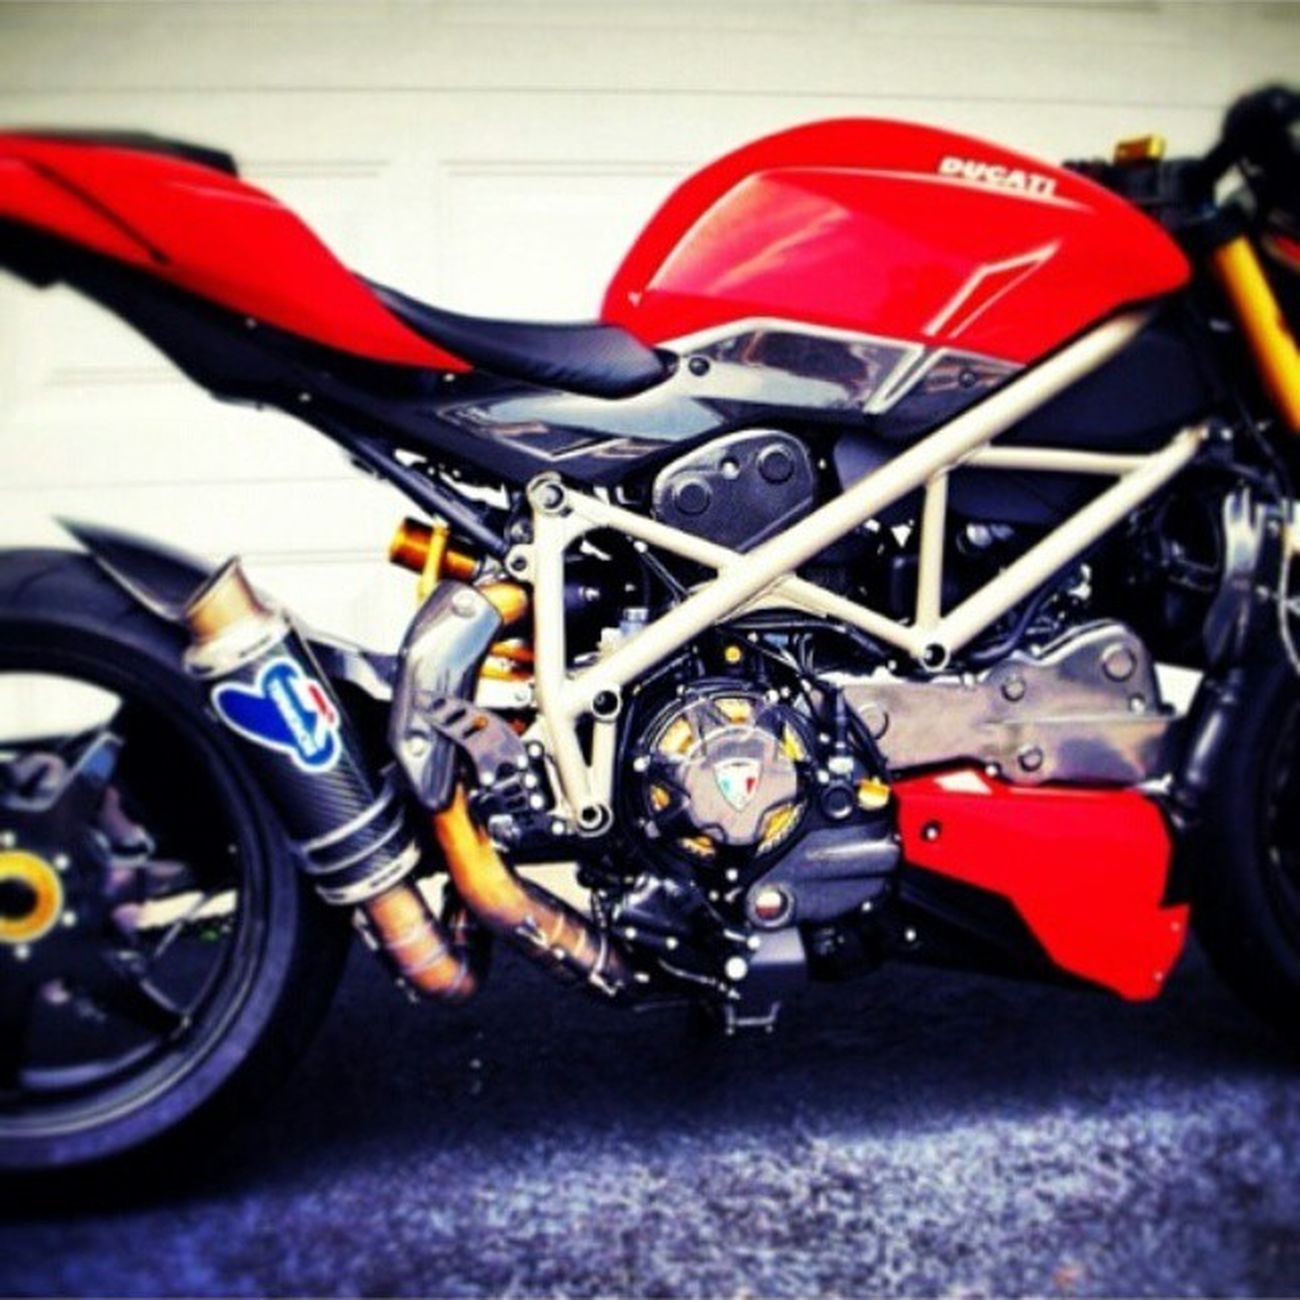 Ducati Ducatistreetfighter Ducatisti Ducatista Ltwin Dryclutch Termignoni Brembo  Ohlins